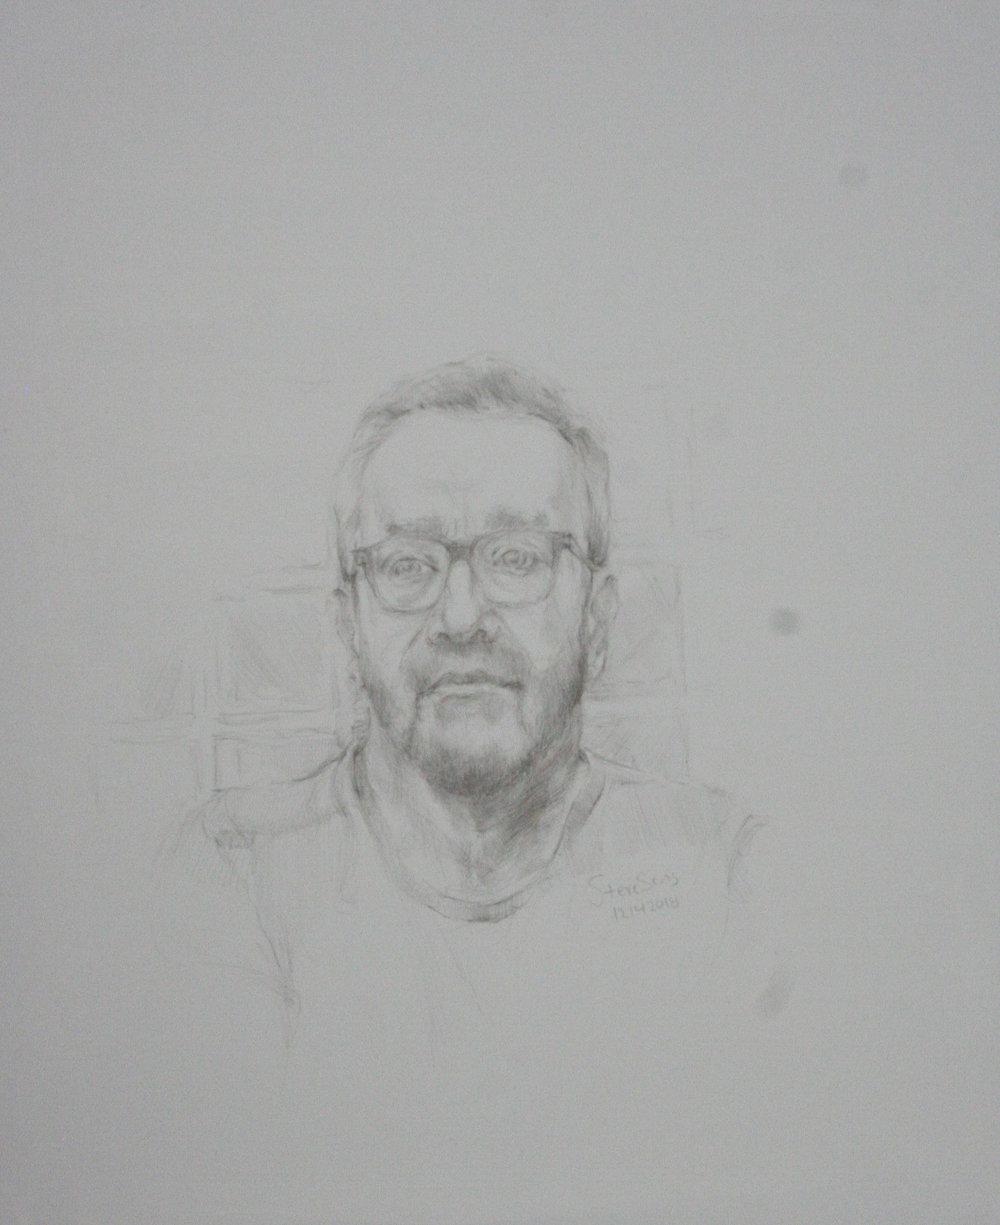 Steve Sens did this drawing.